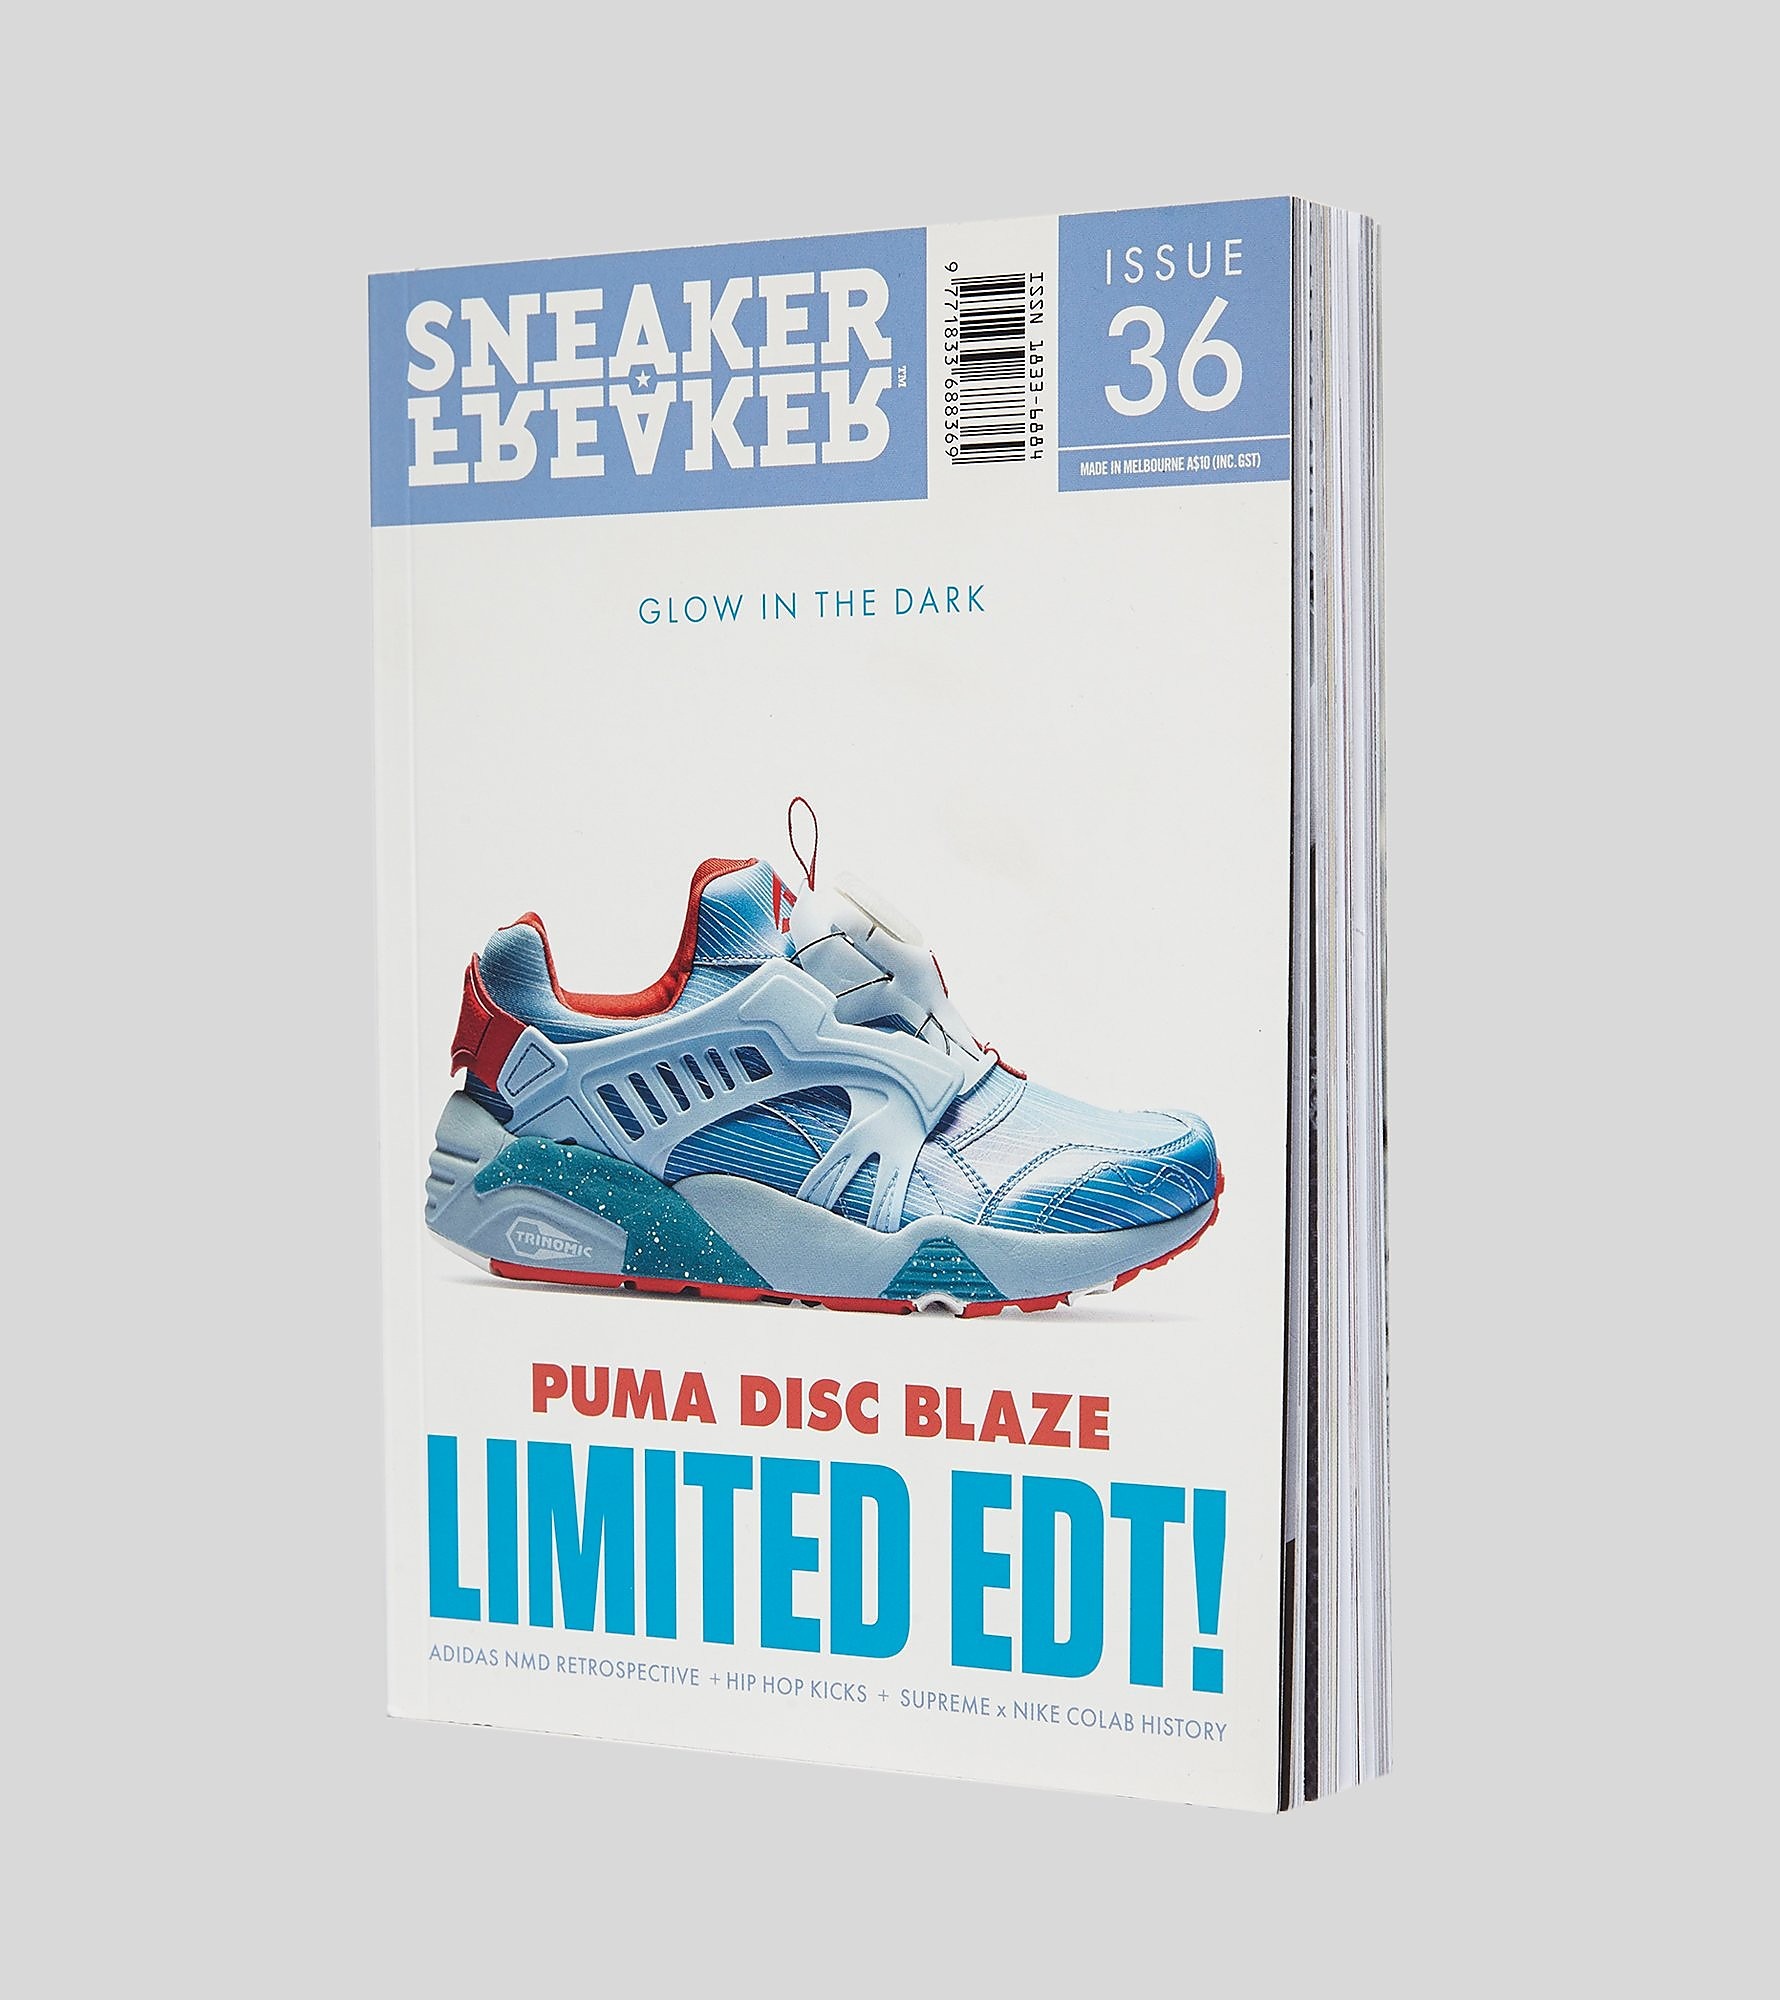 Sneaker Freaker Issue 36